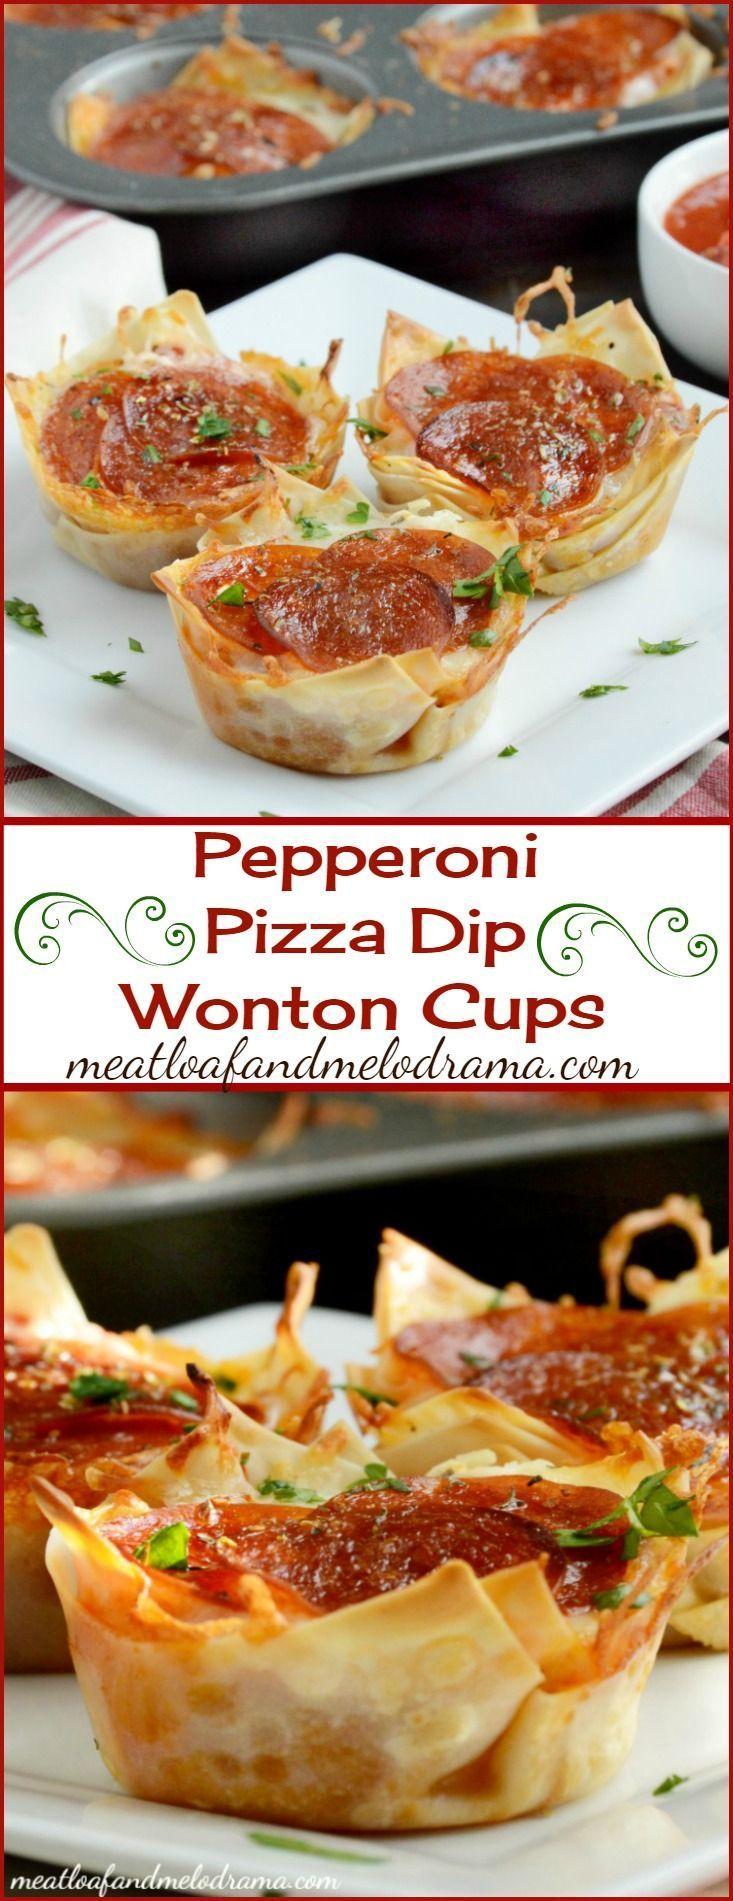 Pepperoni Pizza Dip Wonton Cups Recipe Food recipes